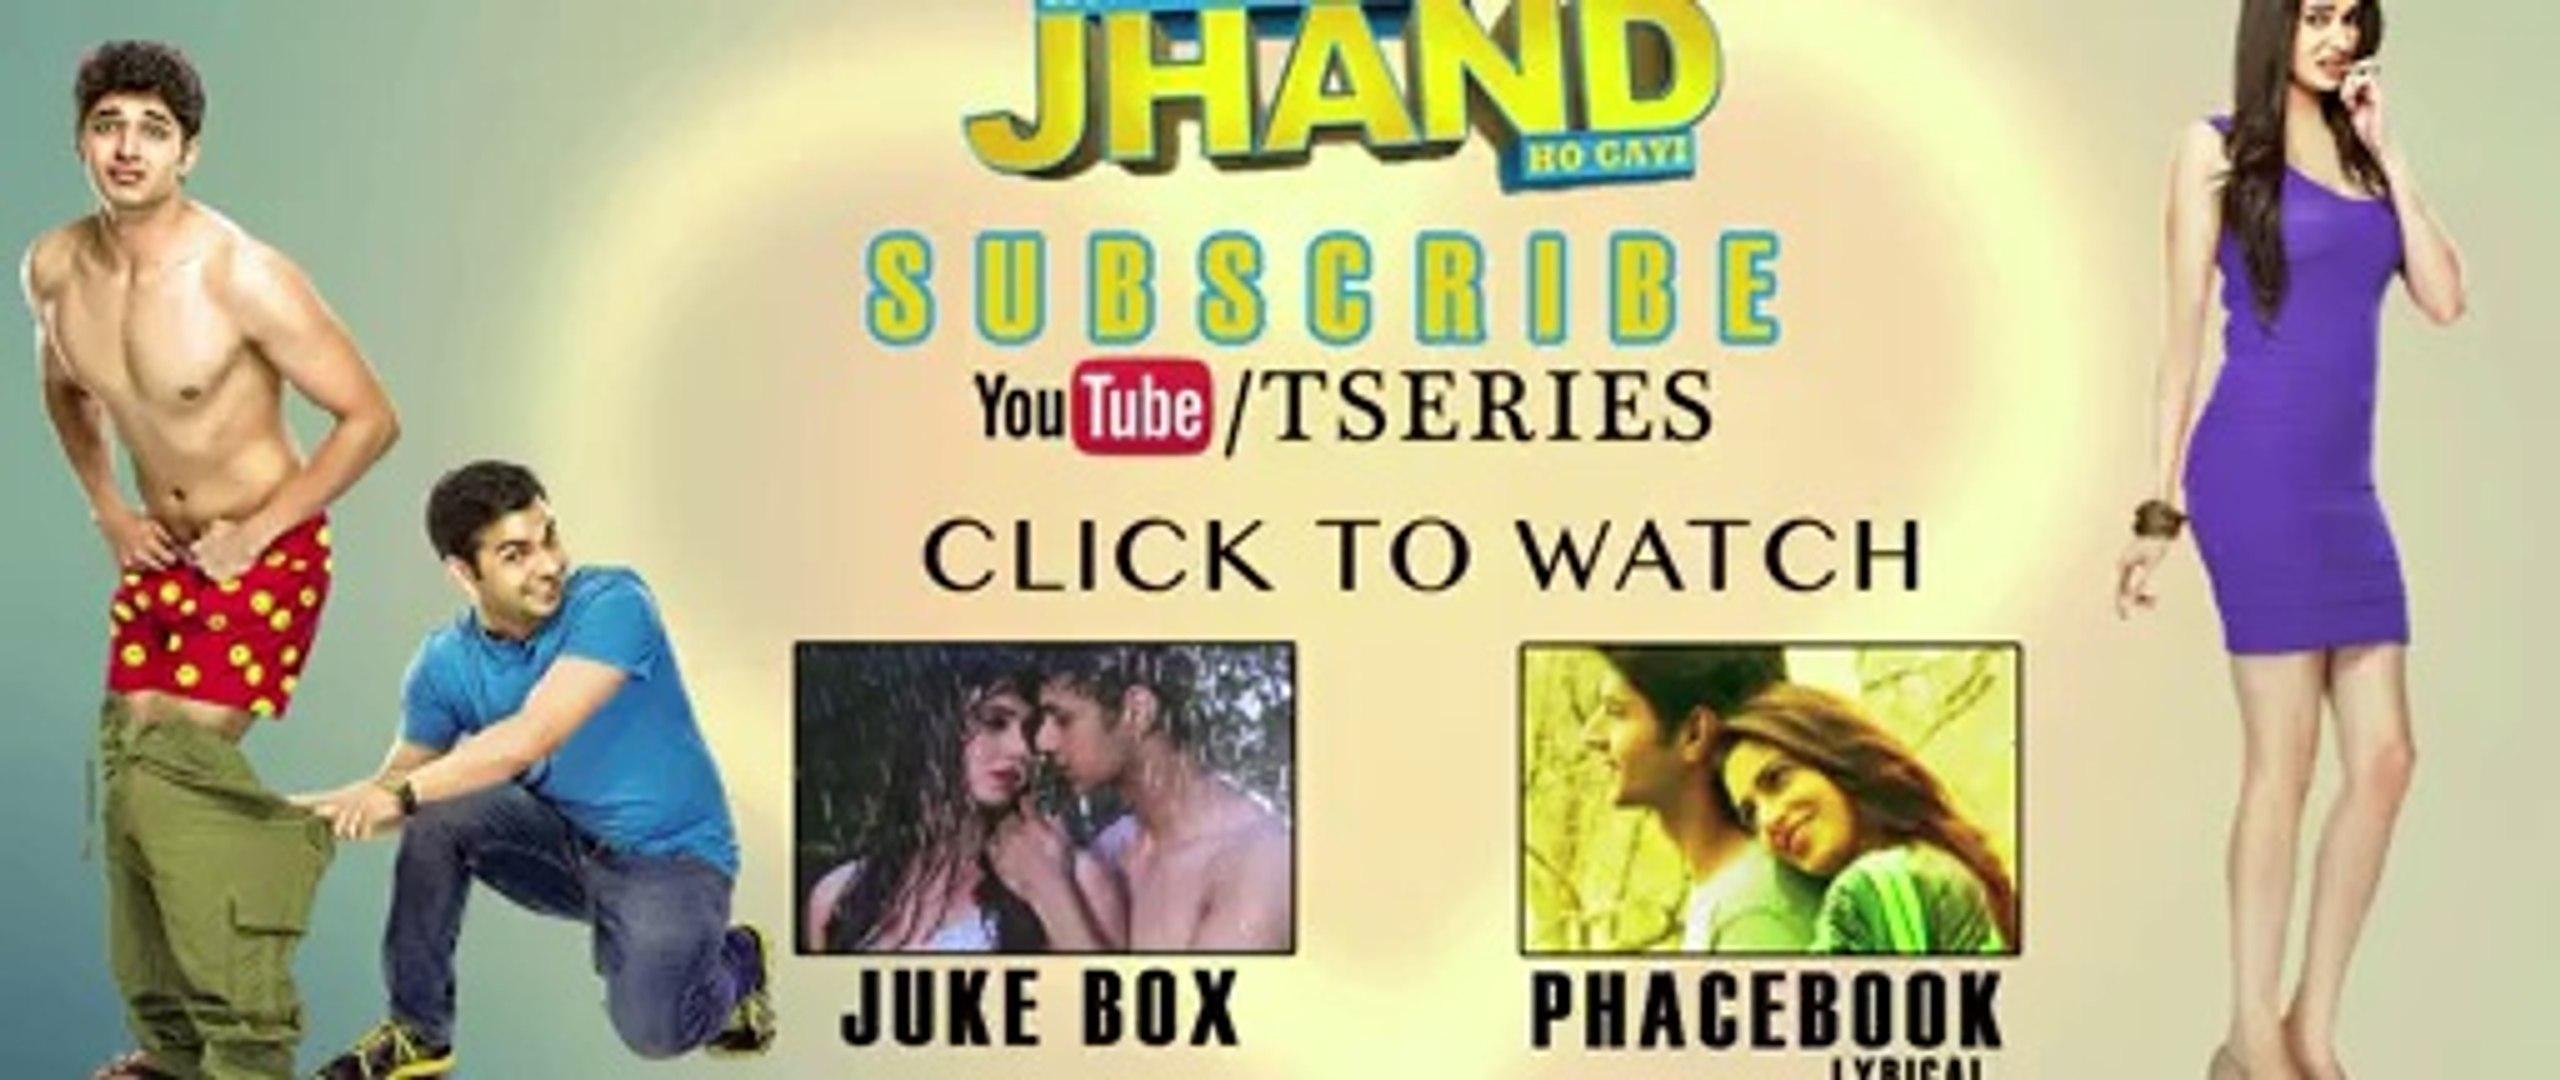 Phacebook Pyaar Full Video Song - Tulsi Kumar - Dr. Palash Sen - Kuku Mathur Ki Jhand Ho gayi - Vide